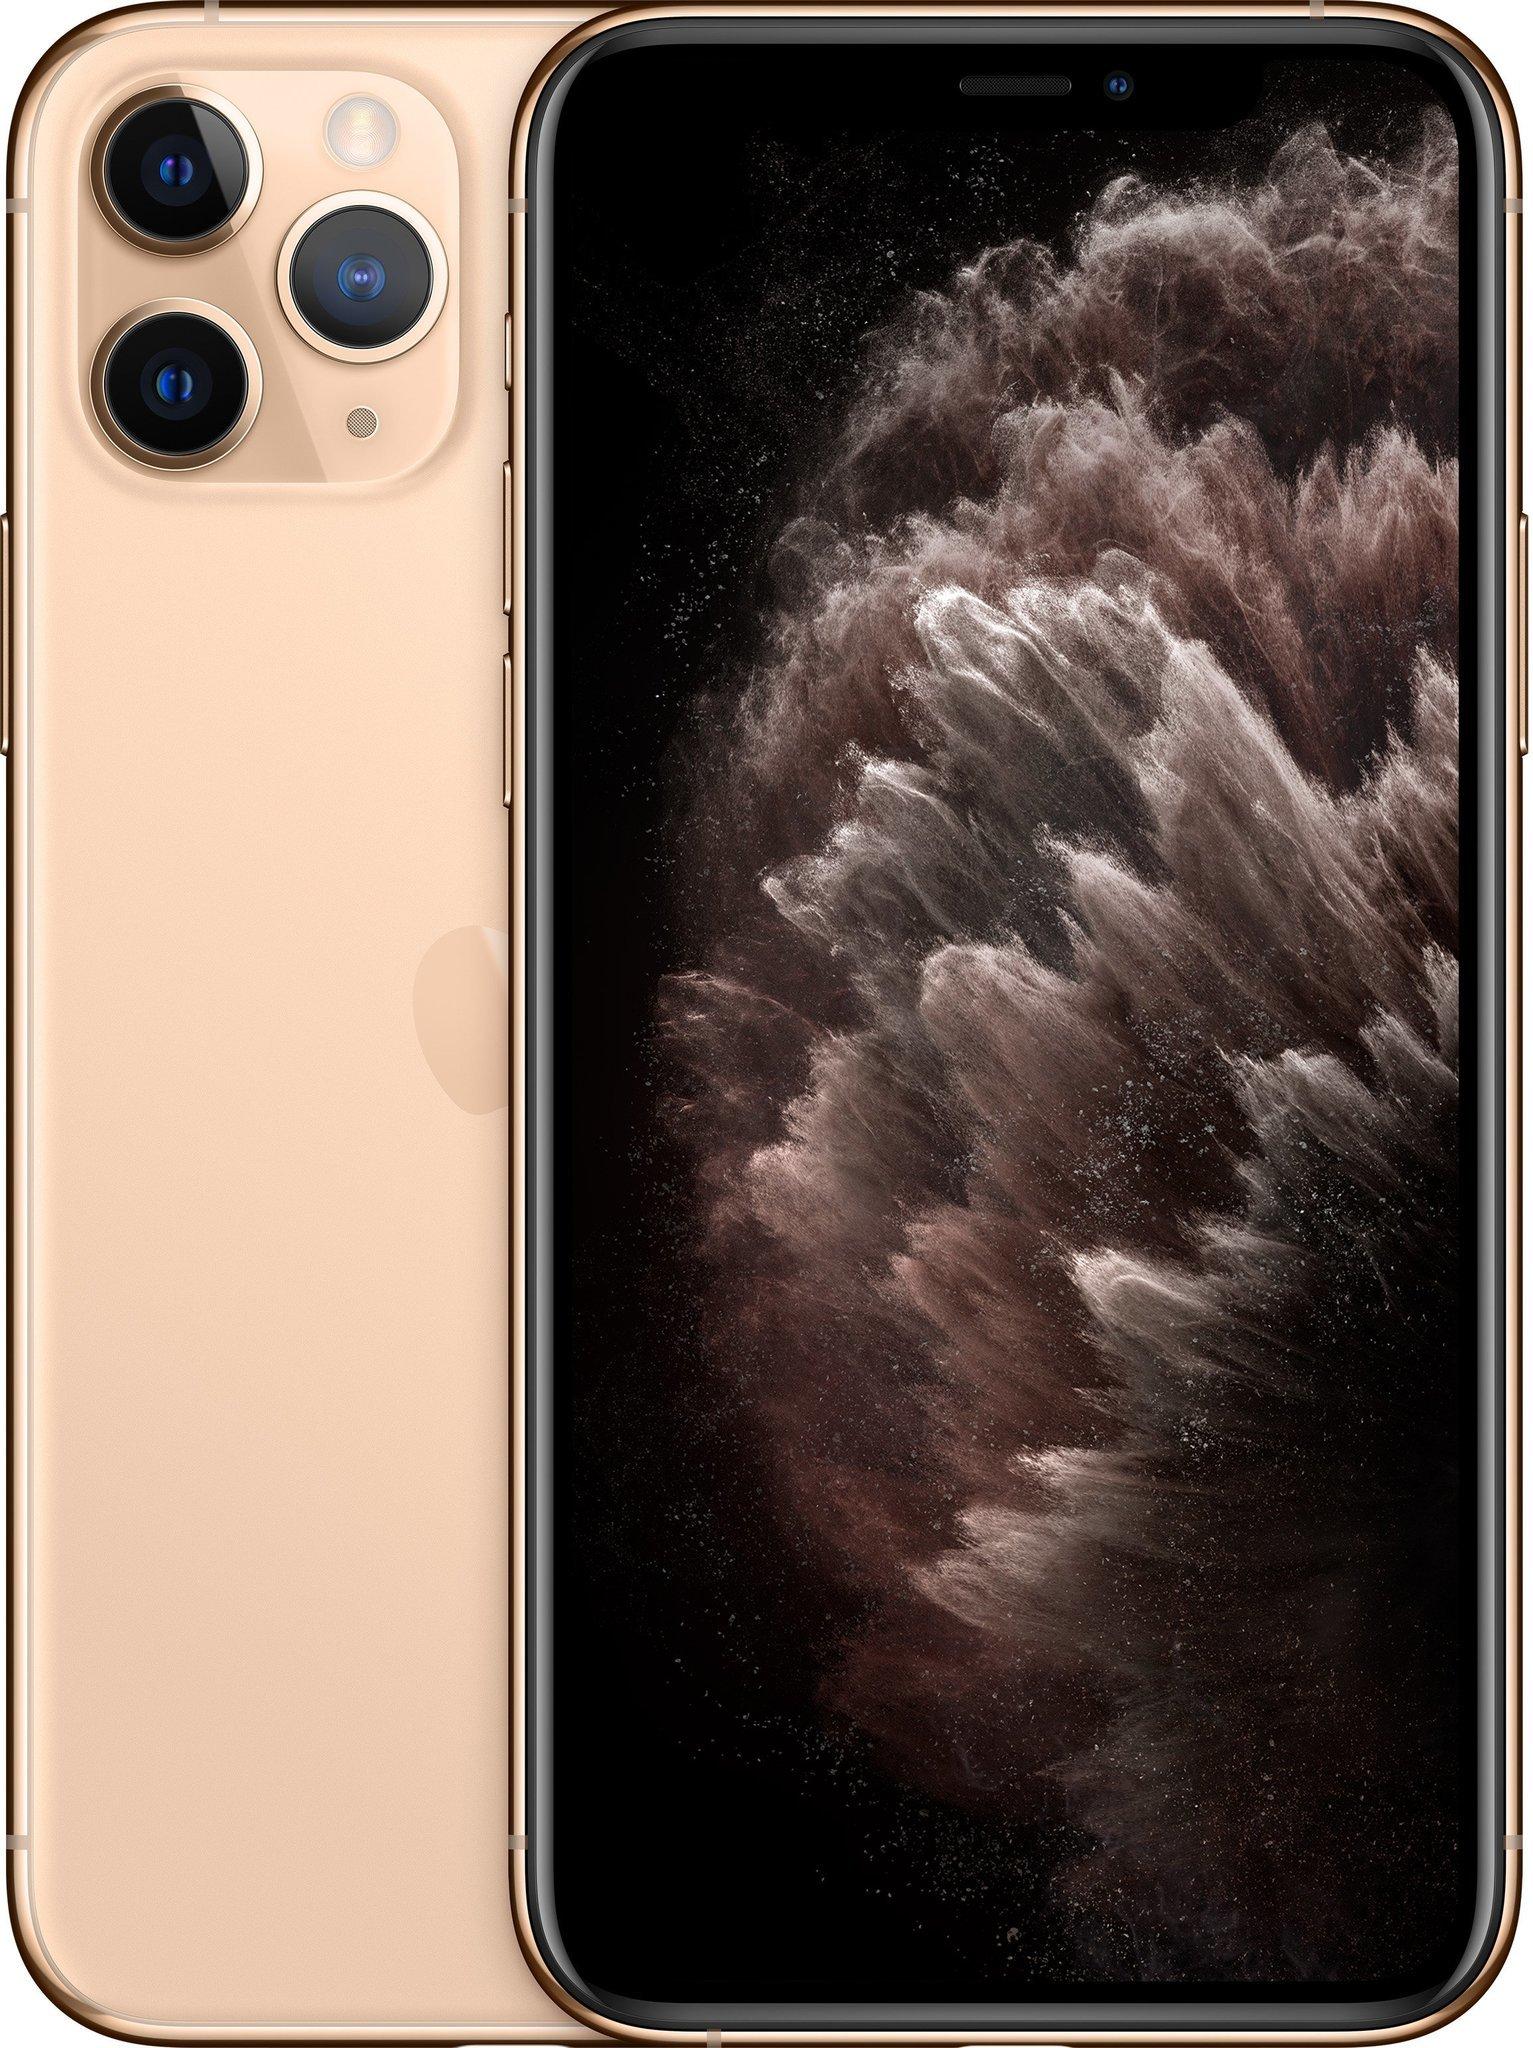 iPhone 11 Pro Apple iPhone 11 Pro 64gb Золотой gold1.jpg